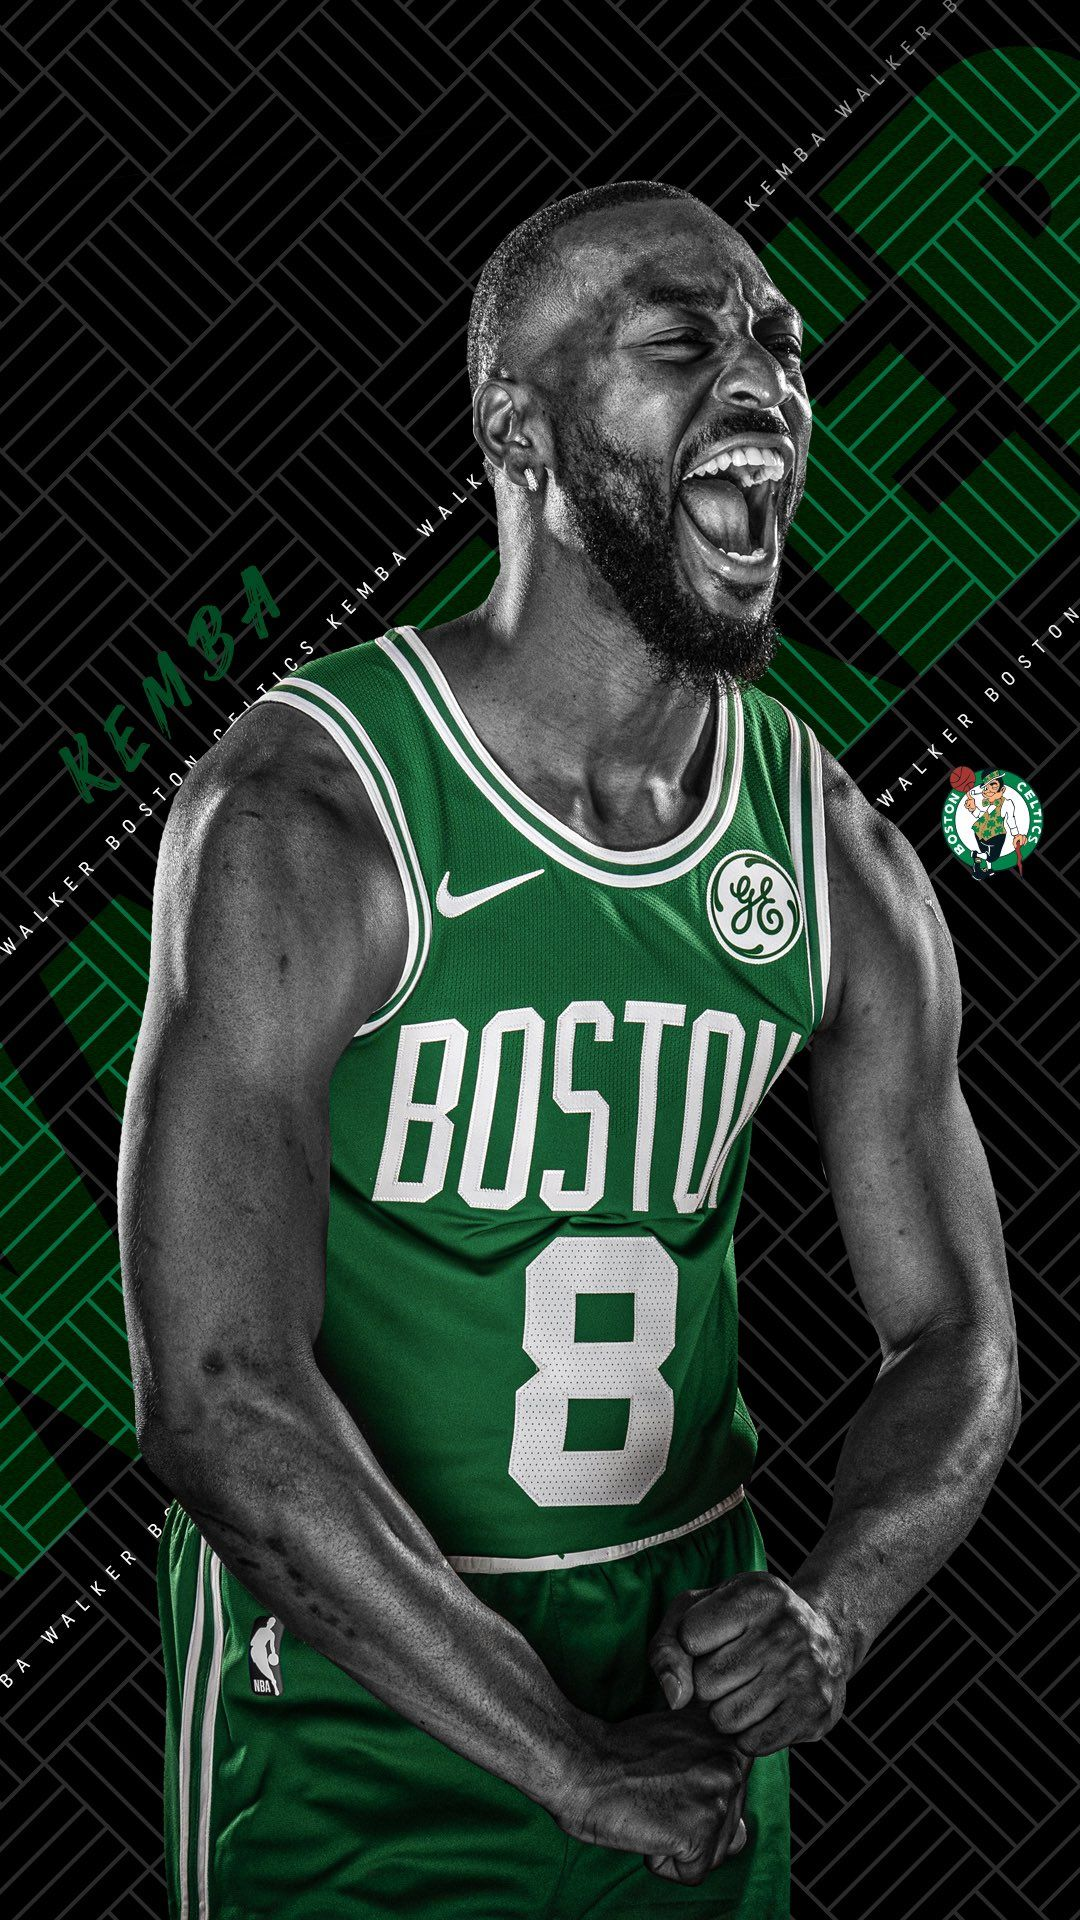 071719 Celtics Basketball Boston Celtics Boston Celtics Players